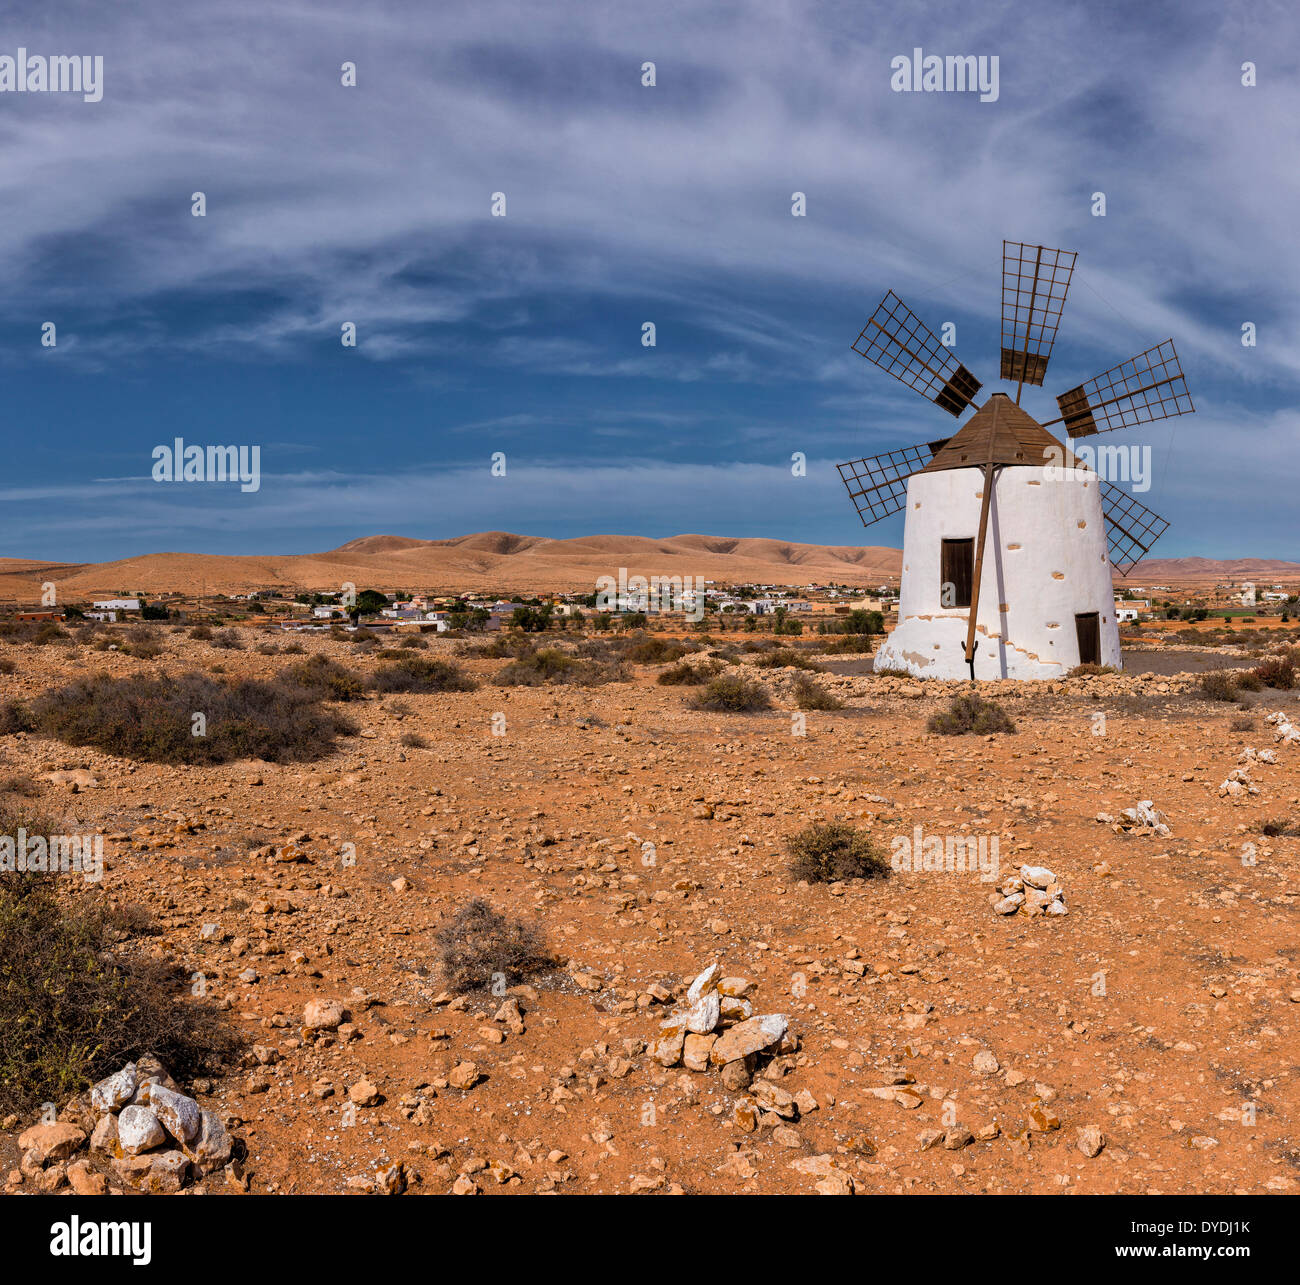 Spanien, Europa, Fuerteventura, Kanarische Inseln, Llanos De La Concepcion, Molino, Windmühle, Dorf, Sommer, Berge, Stockbild